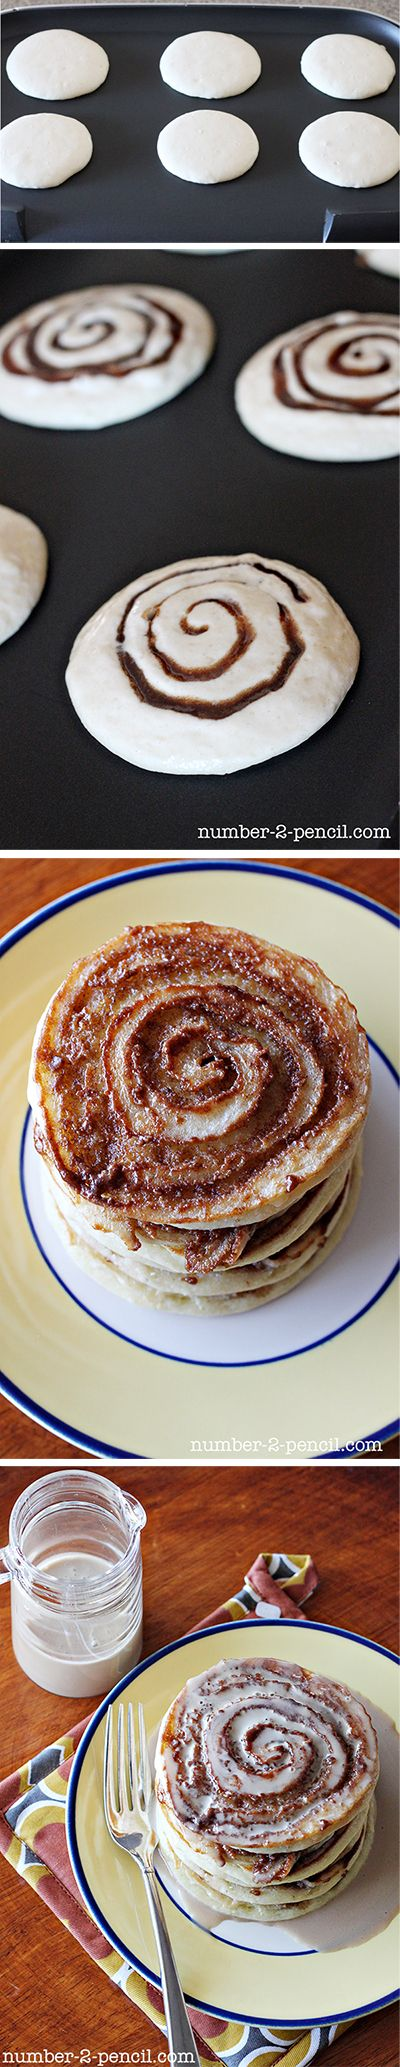 Cinnamon Roll Pancakes! OMG